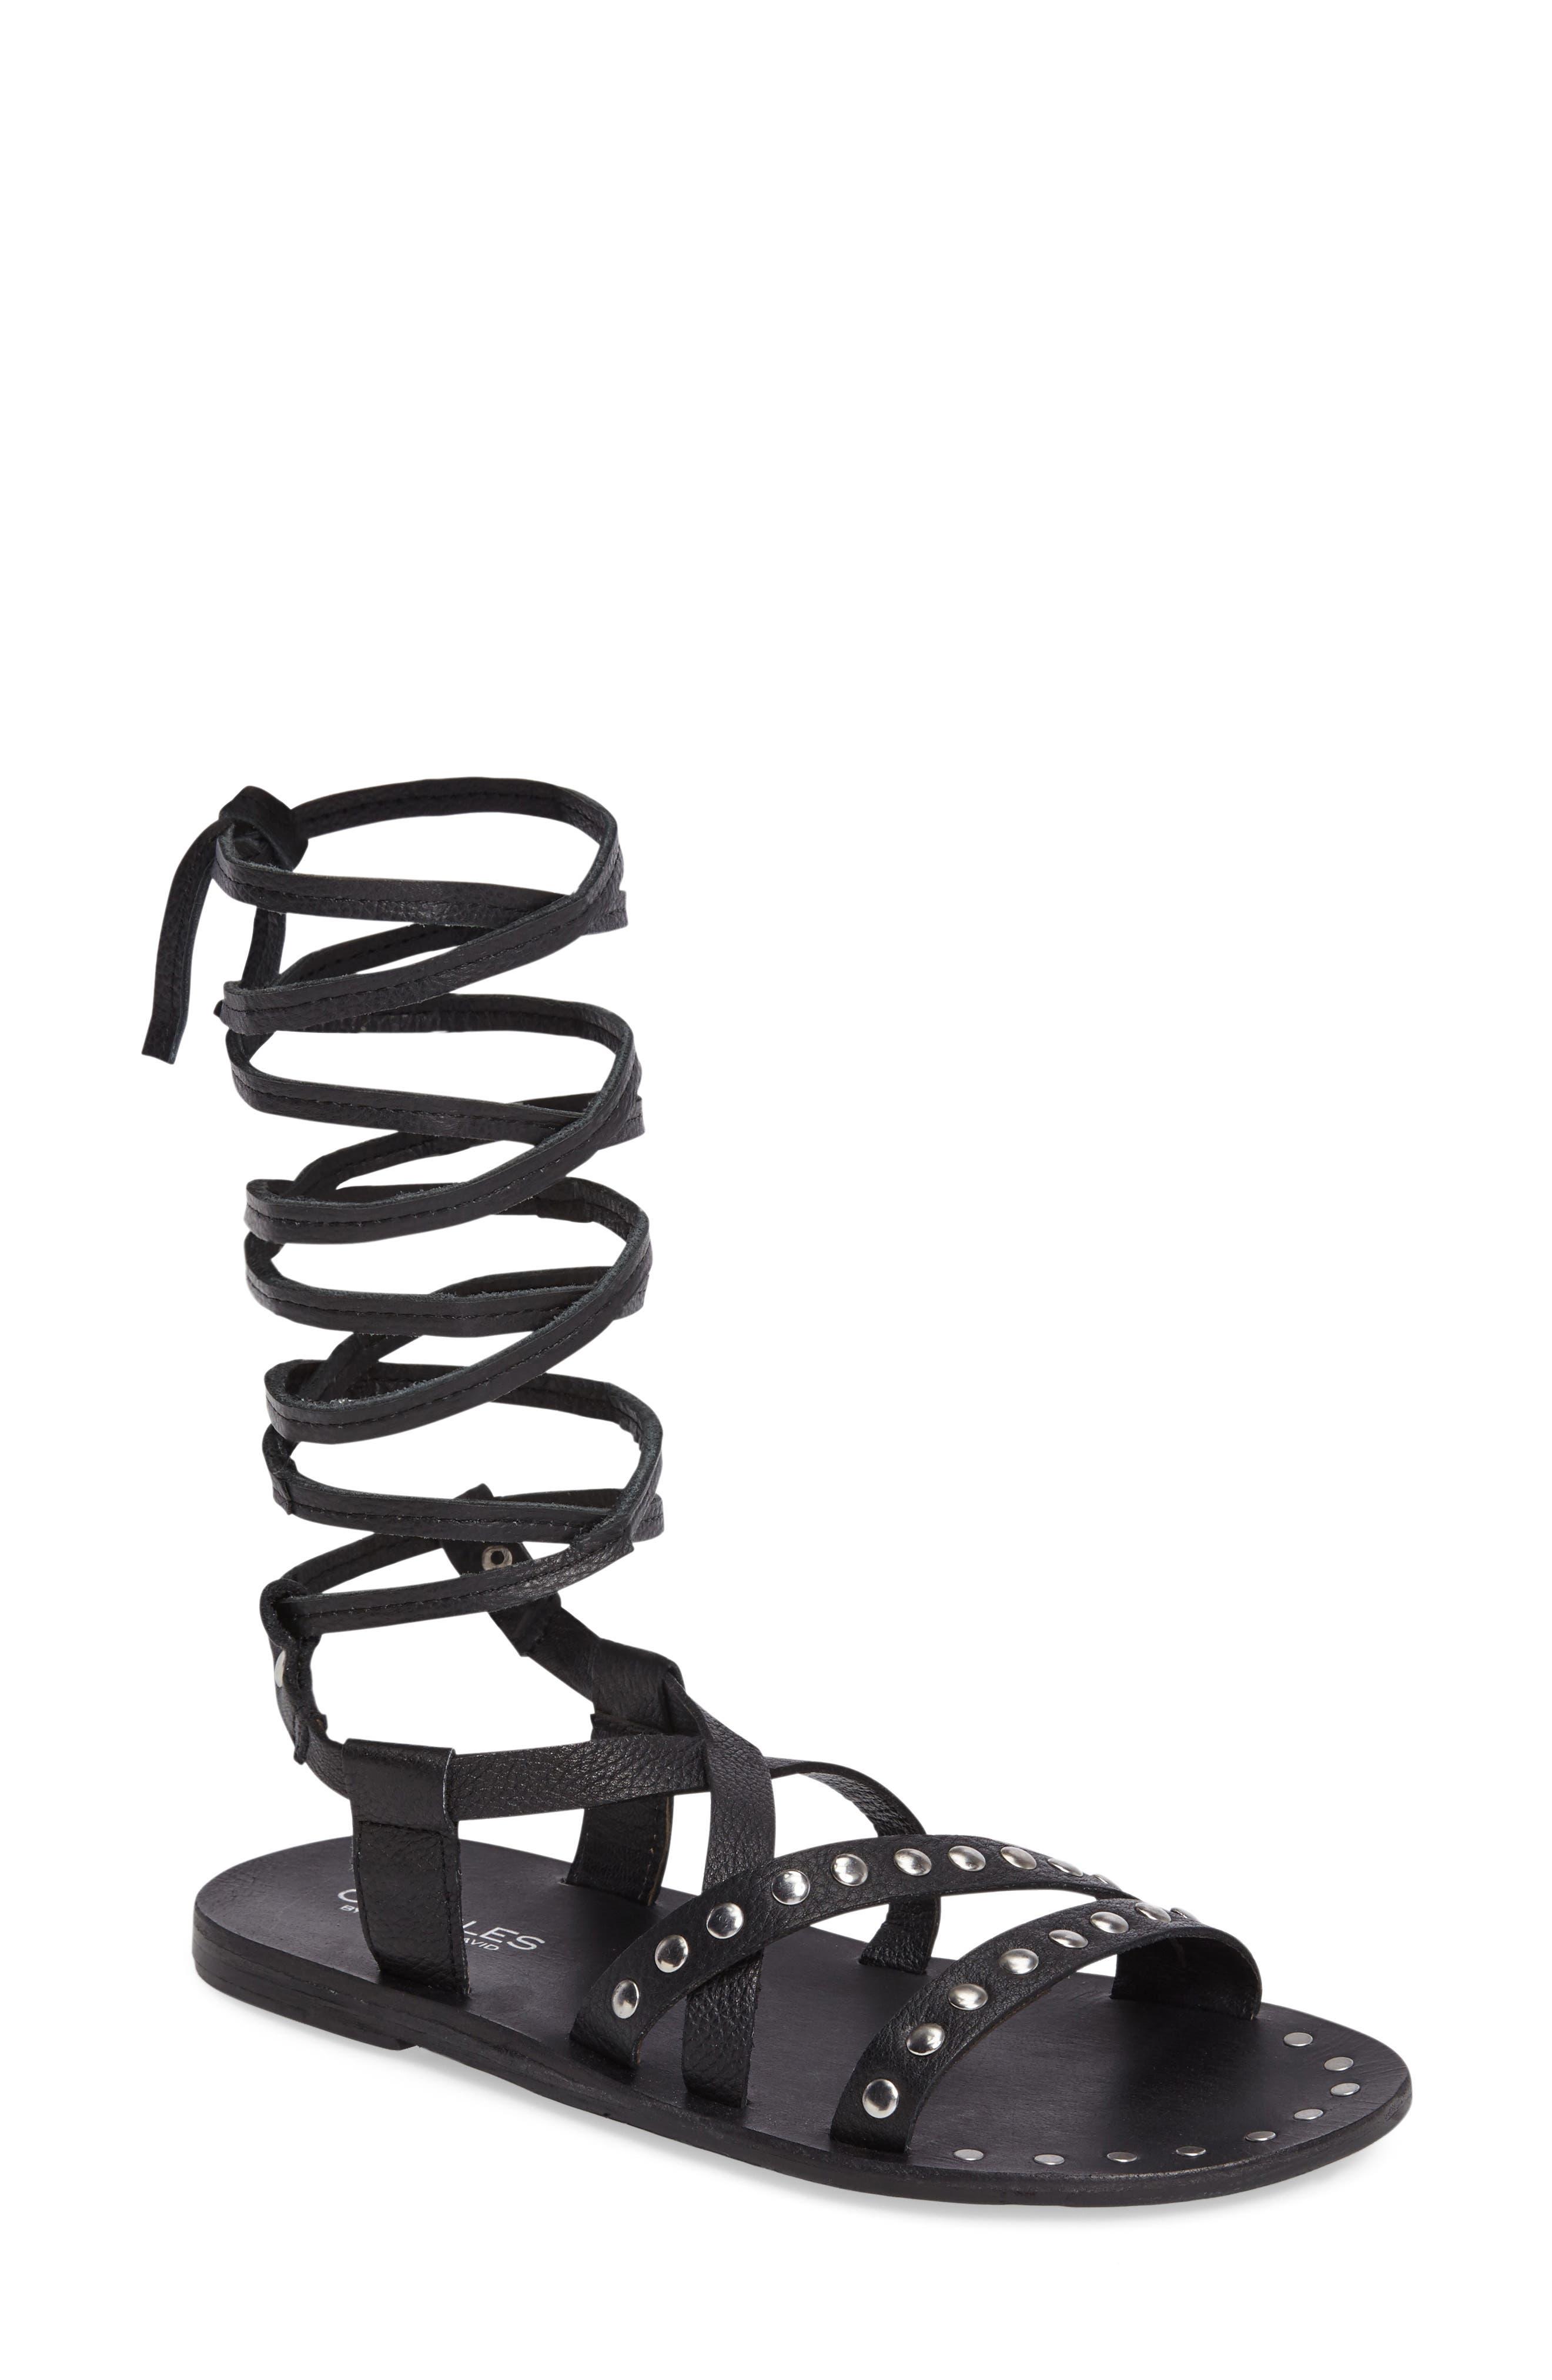 Steeler Ankle Wrap Sandal,                             Main thumbnail 1, color,                             001